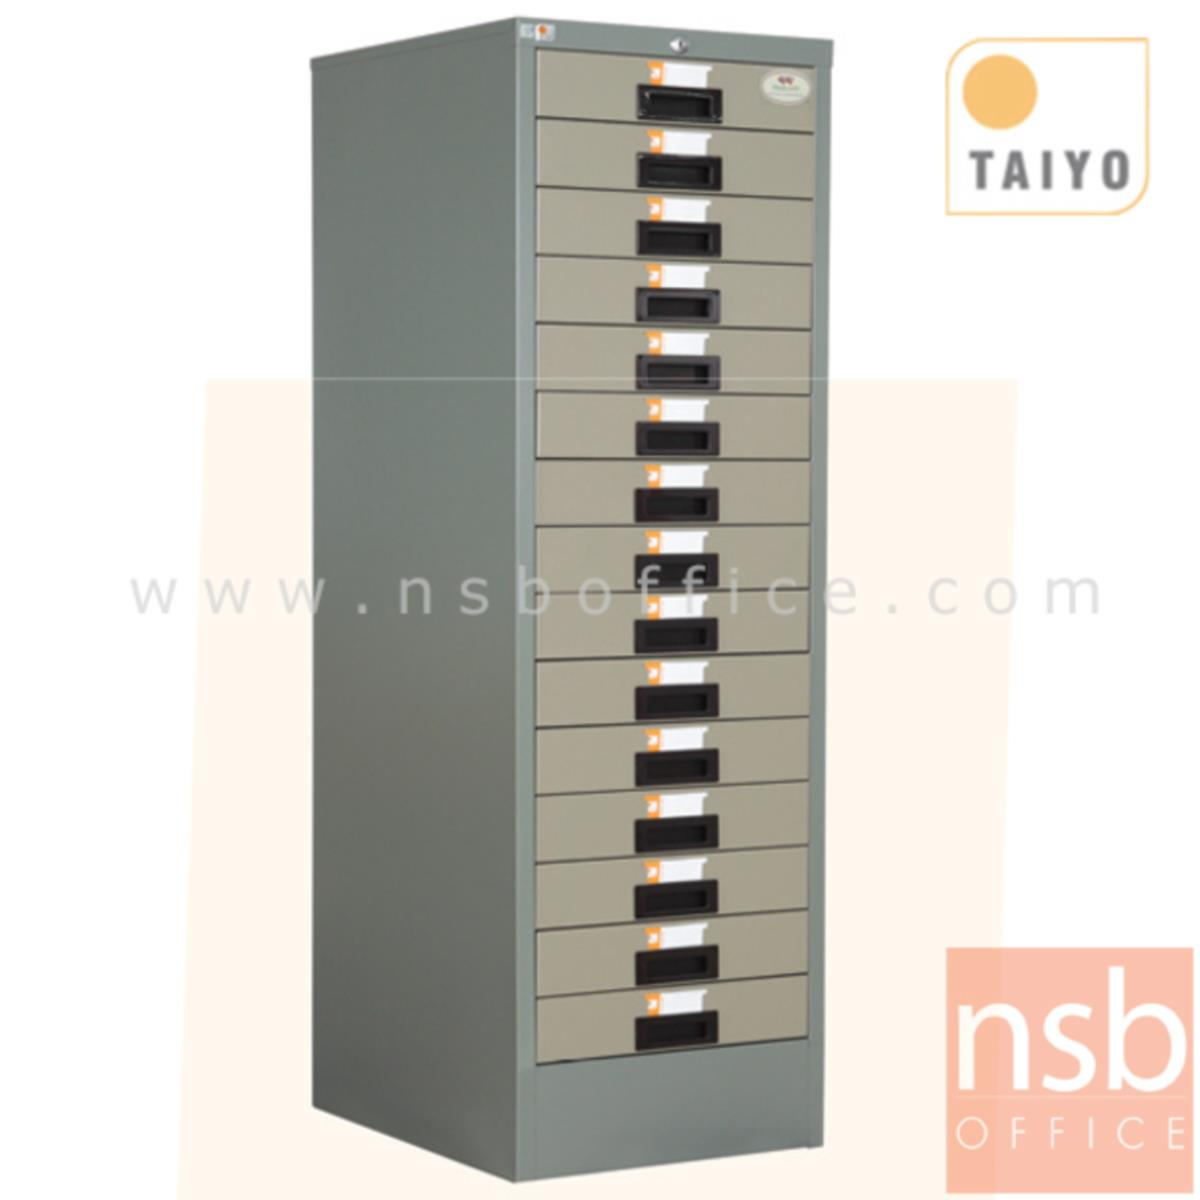 E02A031:ตู้เก็บแบบฟอร์ม 15 ลิ้นชัก ตั้งพื้น (กระดาษ A3) รุ่น FR-915